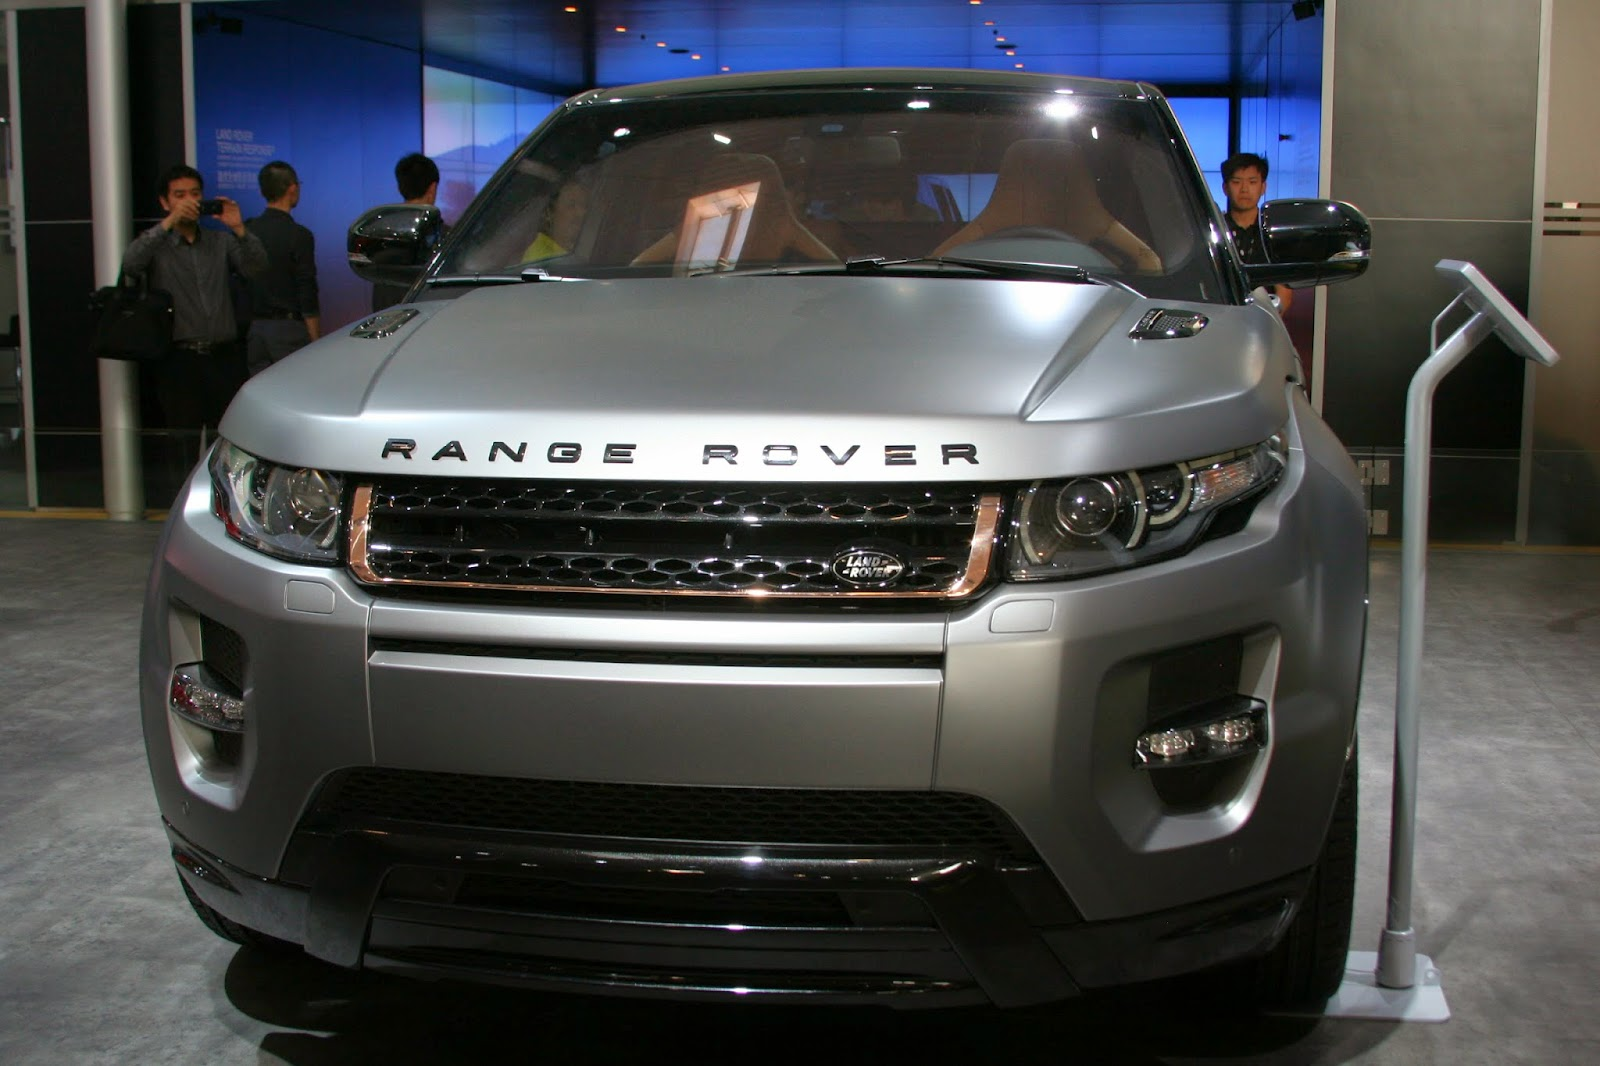 http://4.bp.blogspot.com/-kosxDQ4SK1s/U8eLpMeTjXI/AAAAAAAAJaQ/f57yveArRg0/s1600/2012_Auto_China_Land_Rover_Range_Rover_Evoque_Special_Edition_with_Victoria_Beckham_Beijing_+IMG_3380.JPG